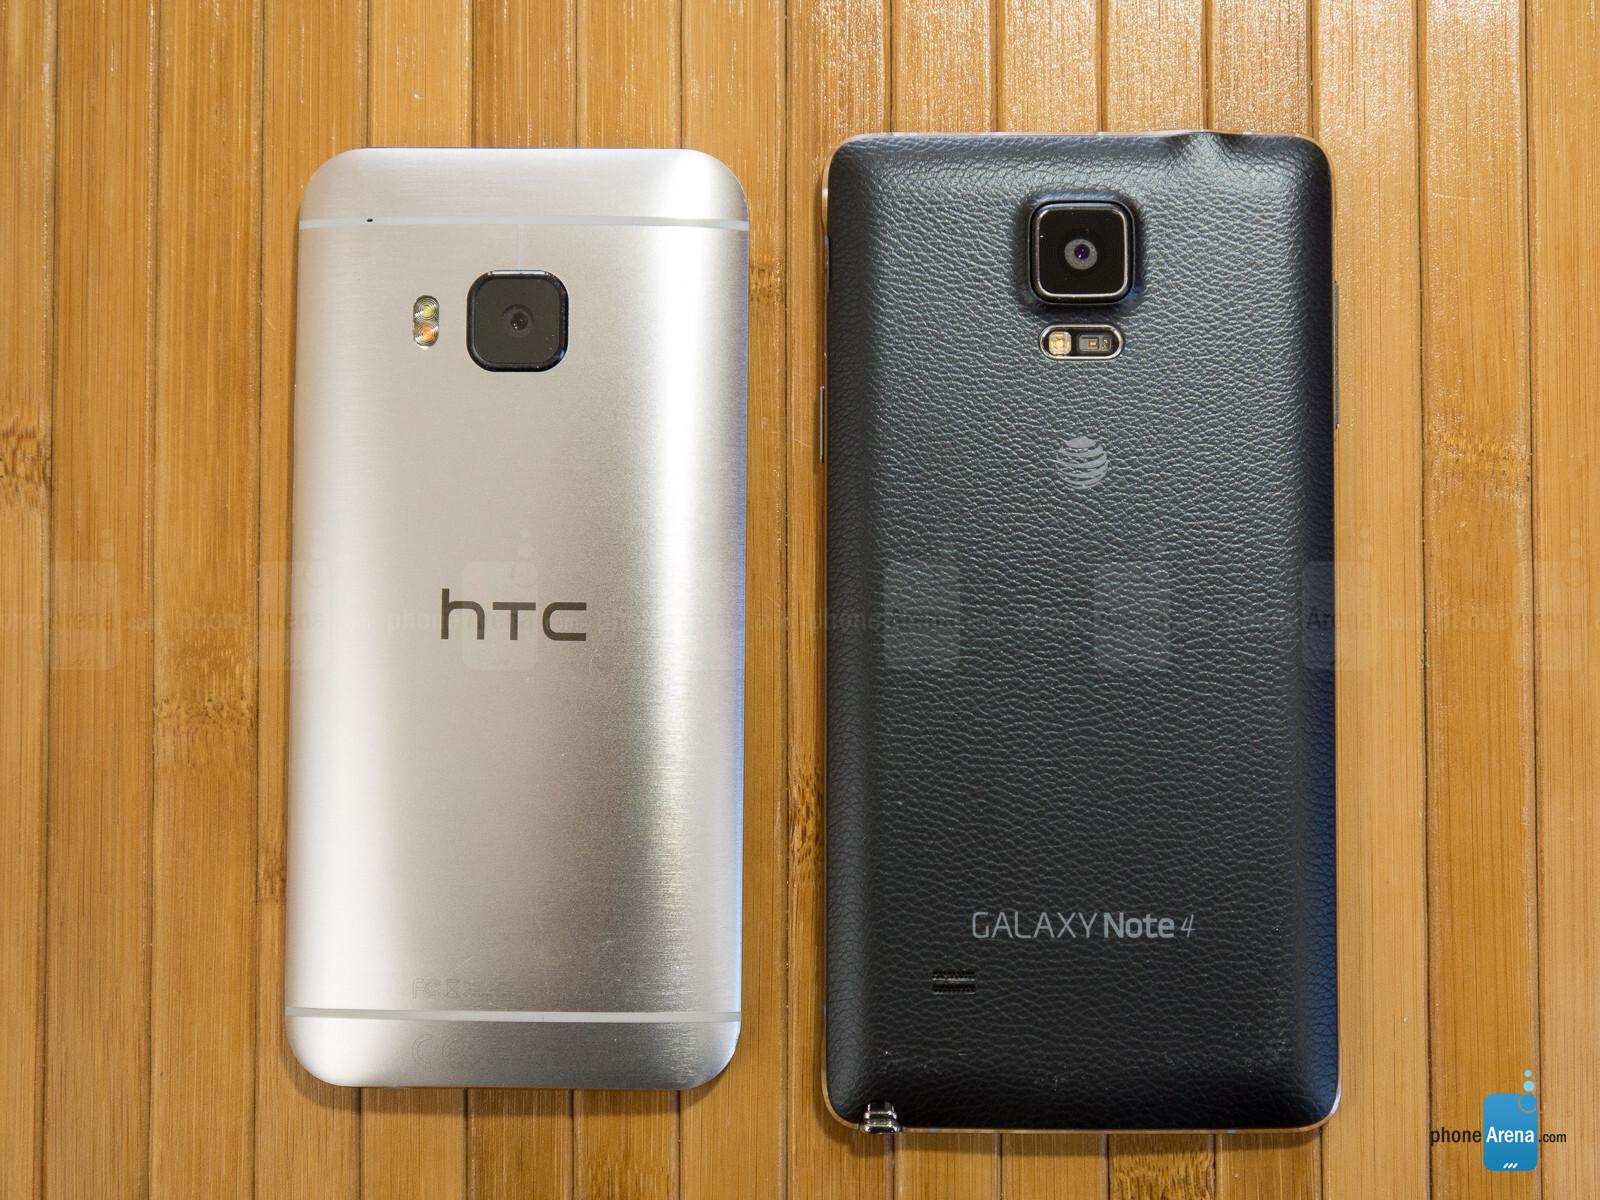 Samsung galaxy note 5 vs htc one m9 plus a comparison - 5